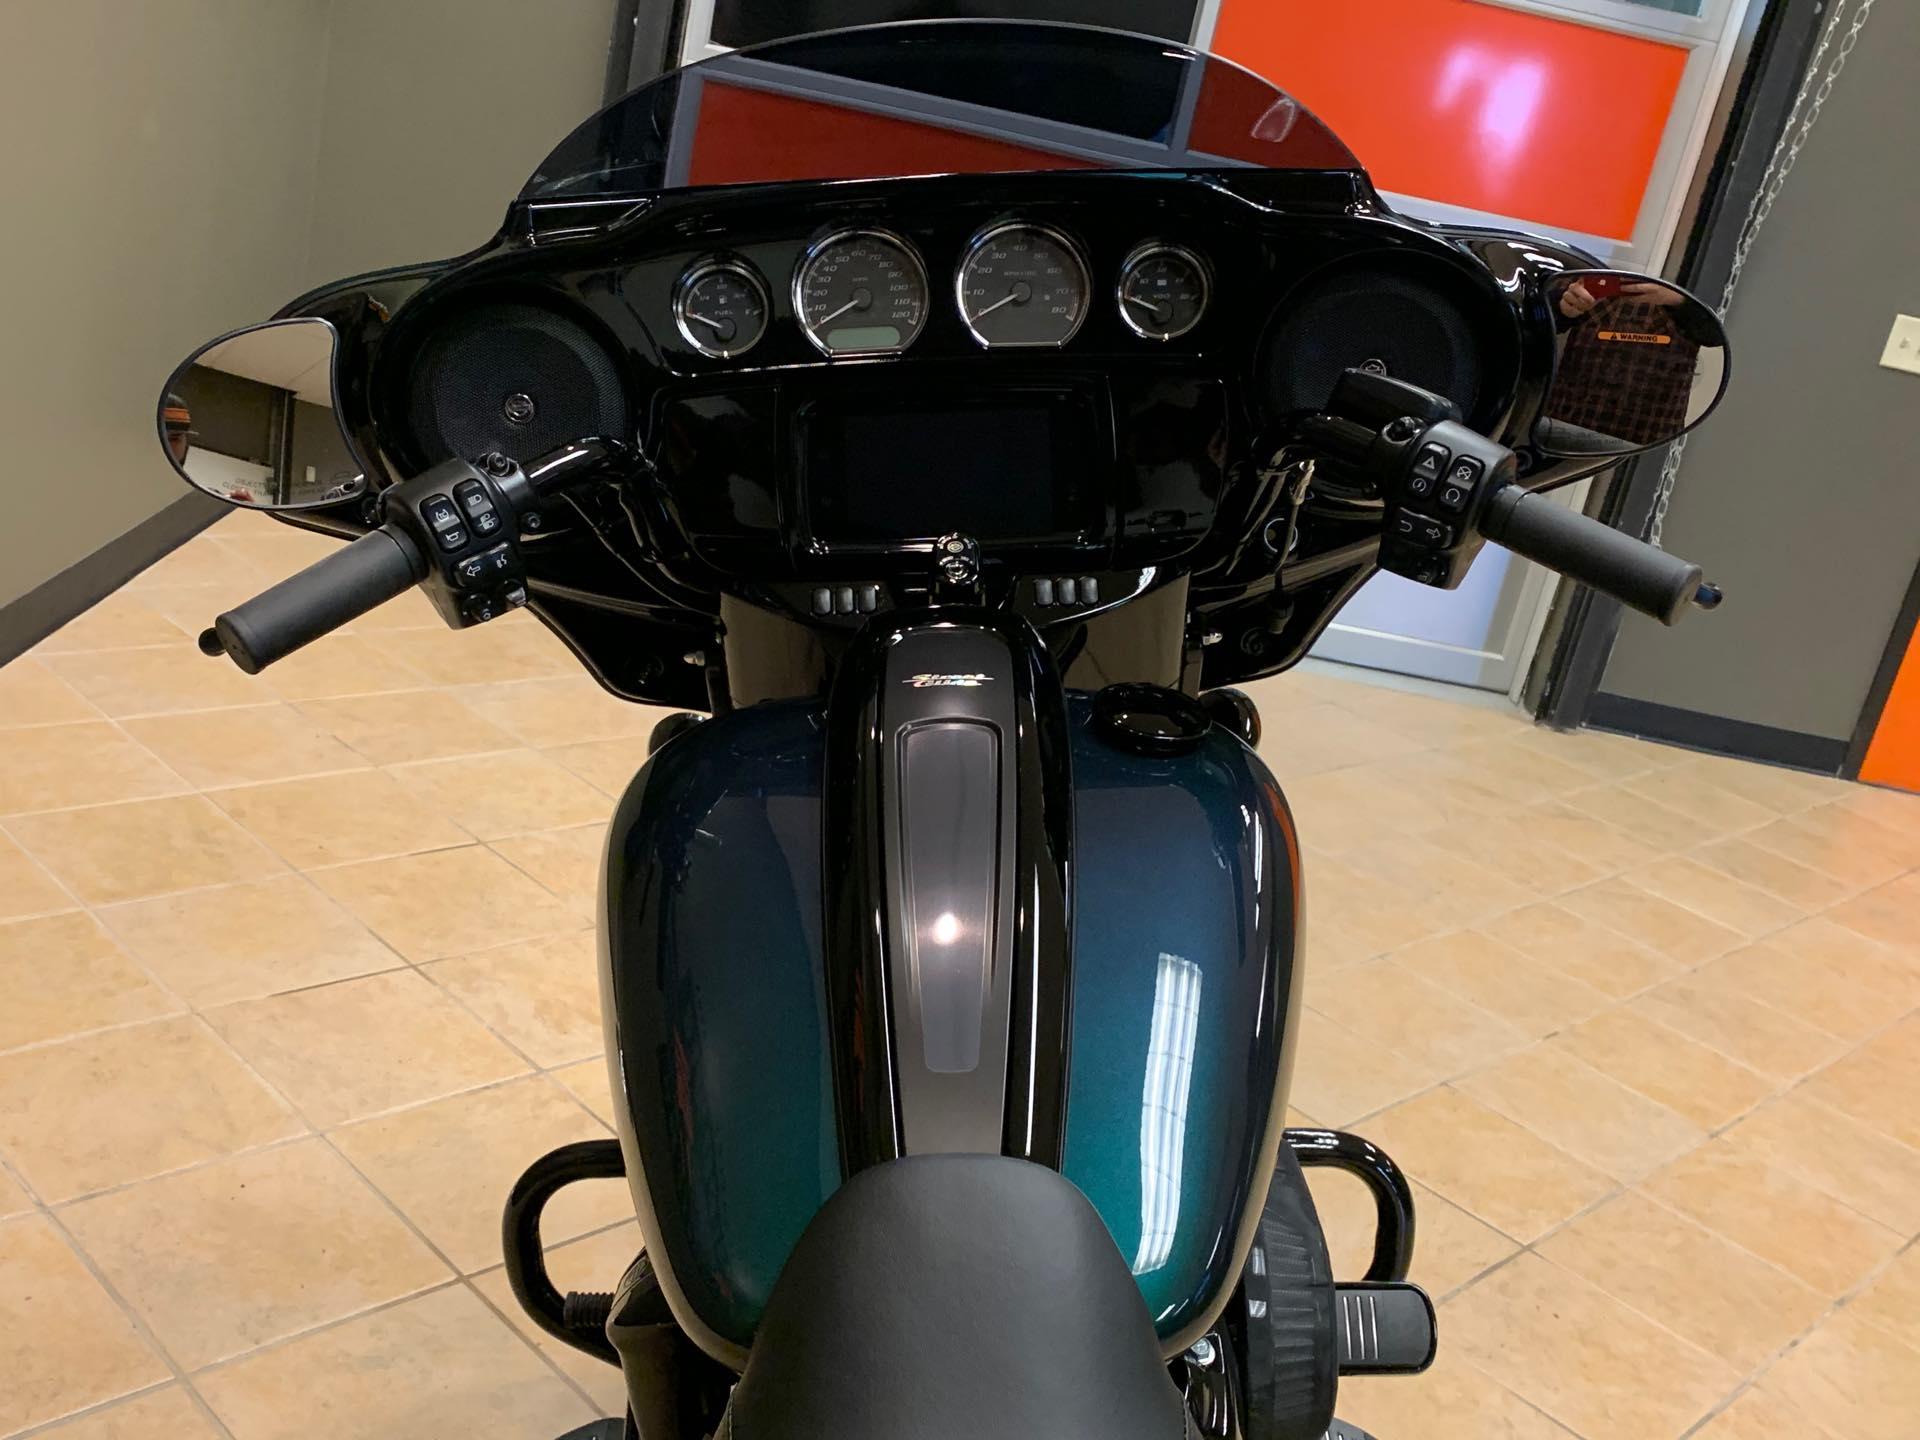 2021 Harley-Davidson Touring FLHXS Street Glide Special at Loess Hills Harley-Davidson